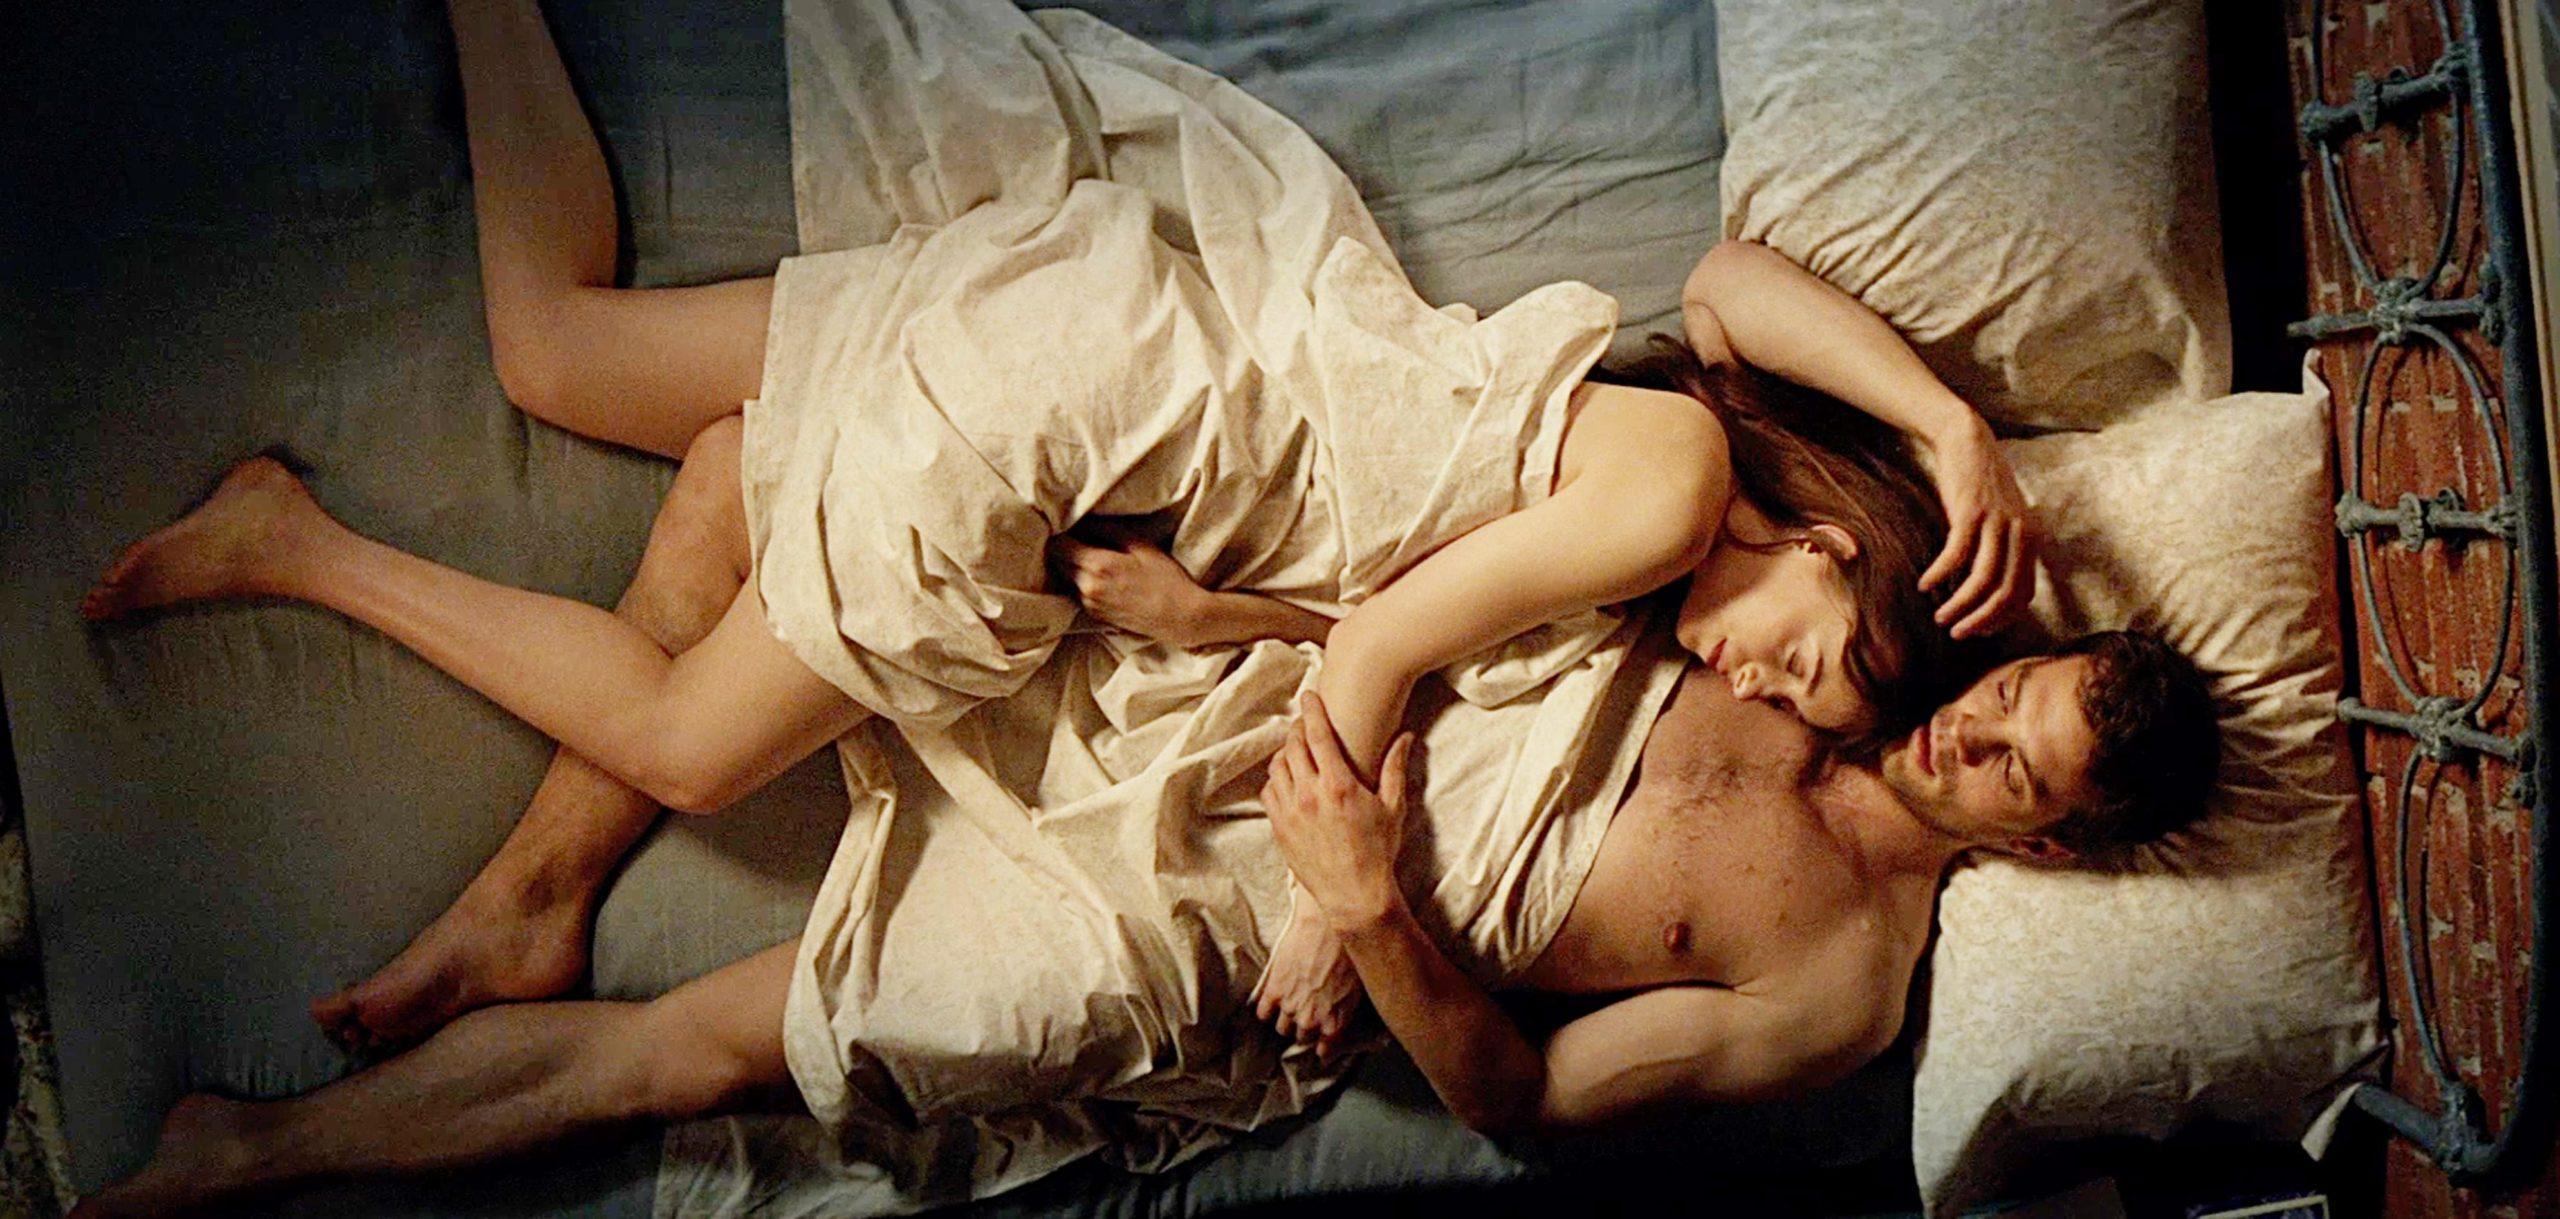 Erotic Movies Sexy18+ Classic Romantic Movie Best Drama Movie 2017